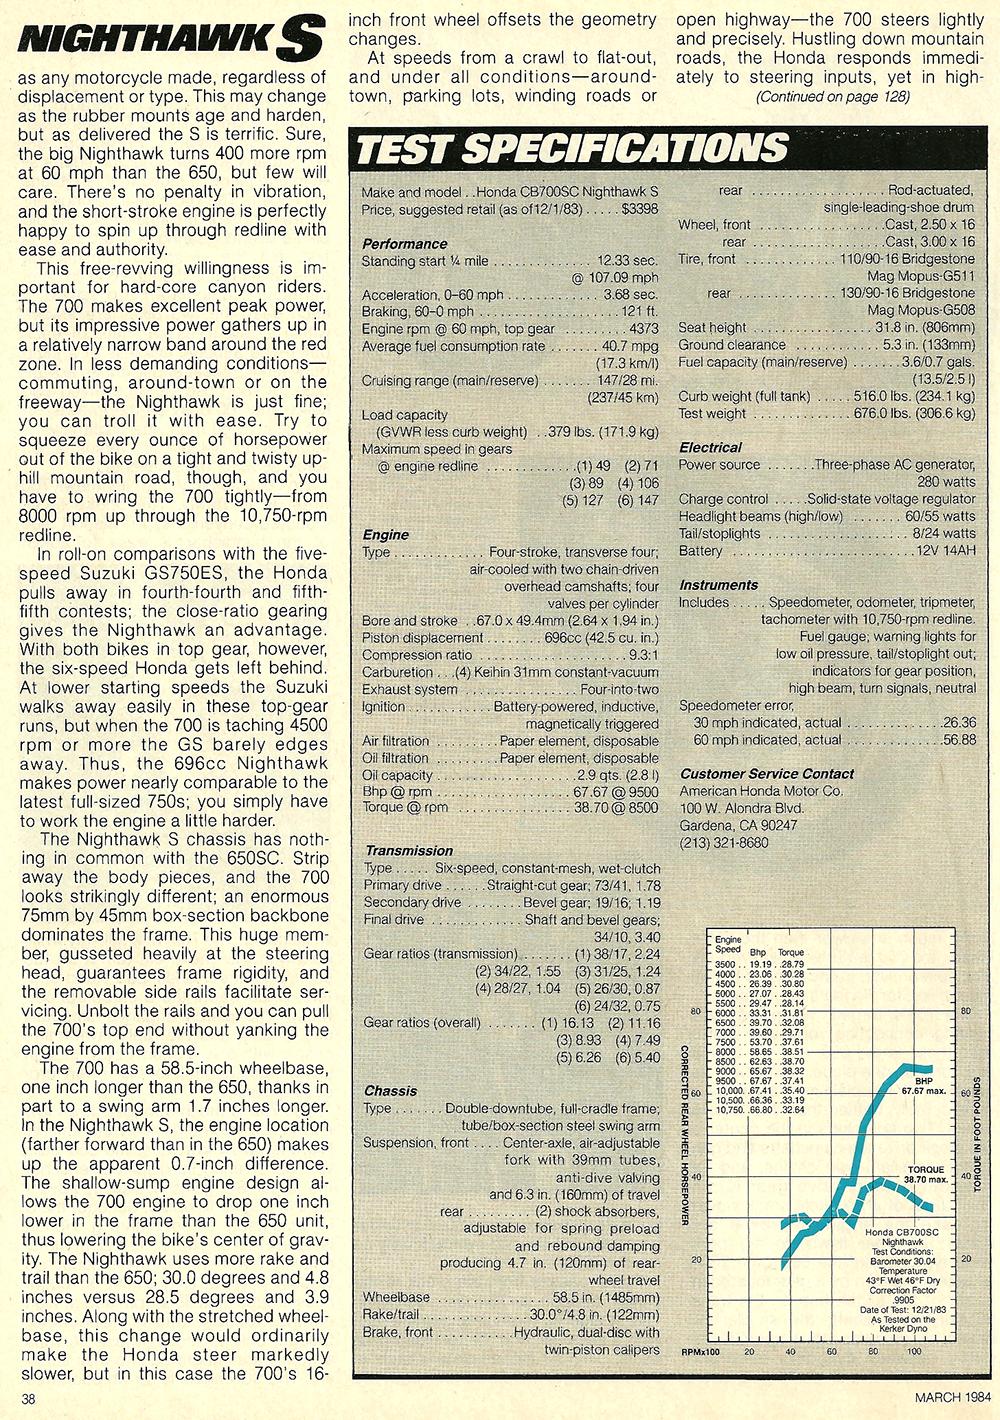 1984 Honda CB700SC Nighthawk S road test 7.jpg